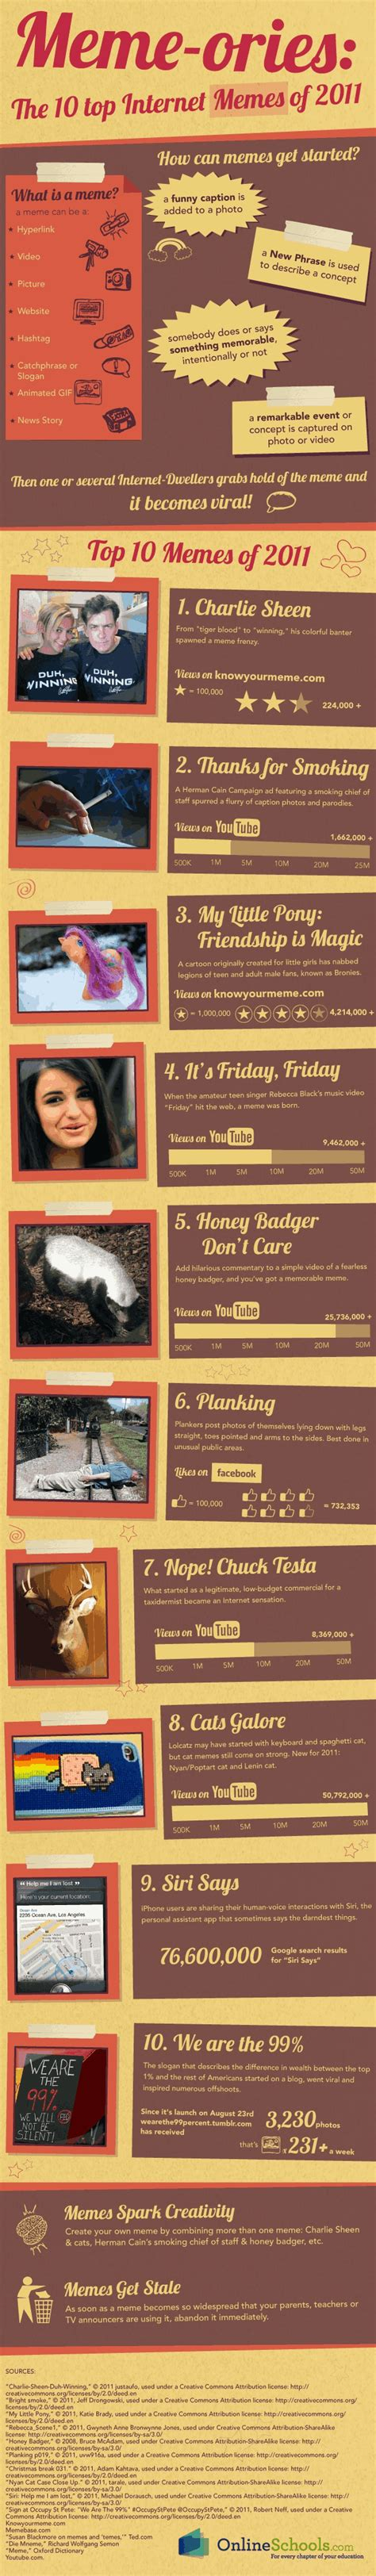 Best Memes Of 2011 - infographic top internet memes of 2011 memeories online schools